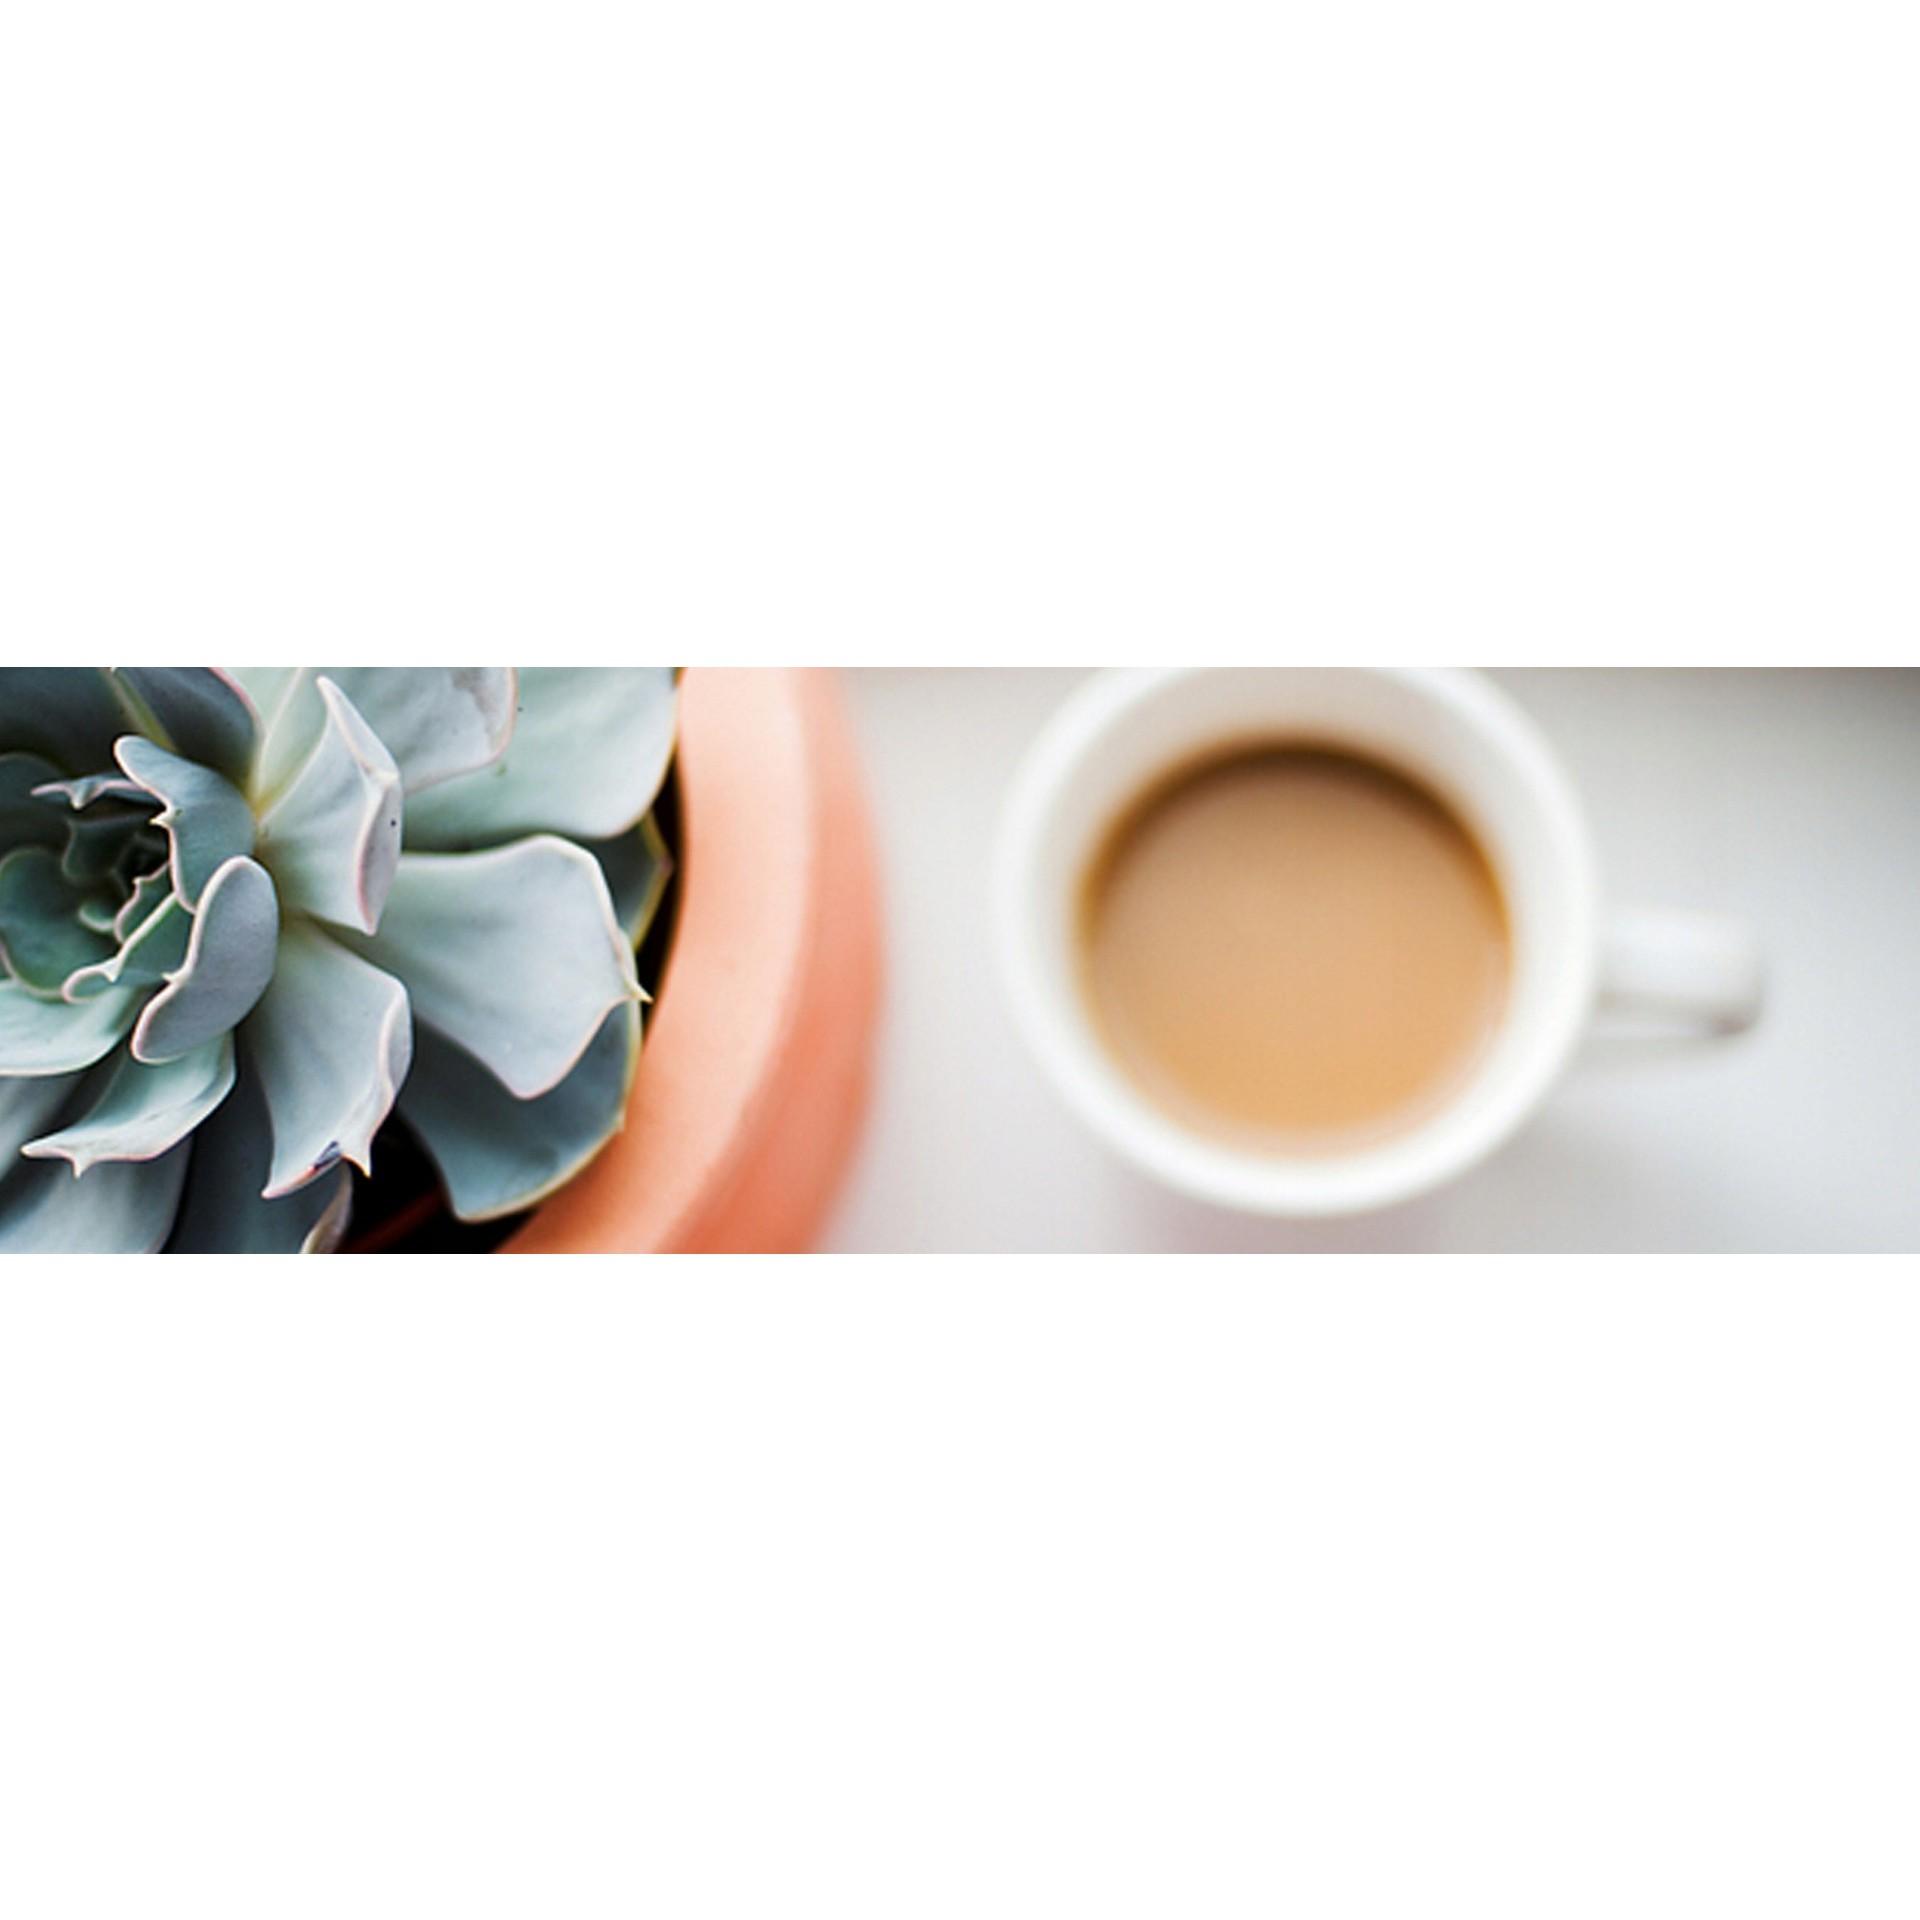 Šálky na espresso 2ks porcelánové s podšálkami megamix.sk